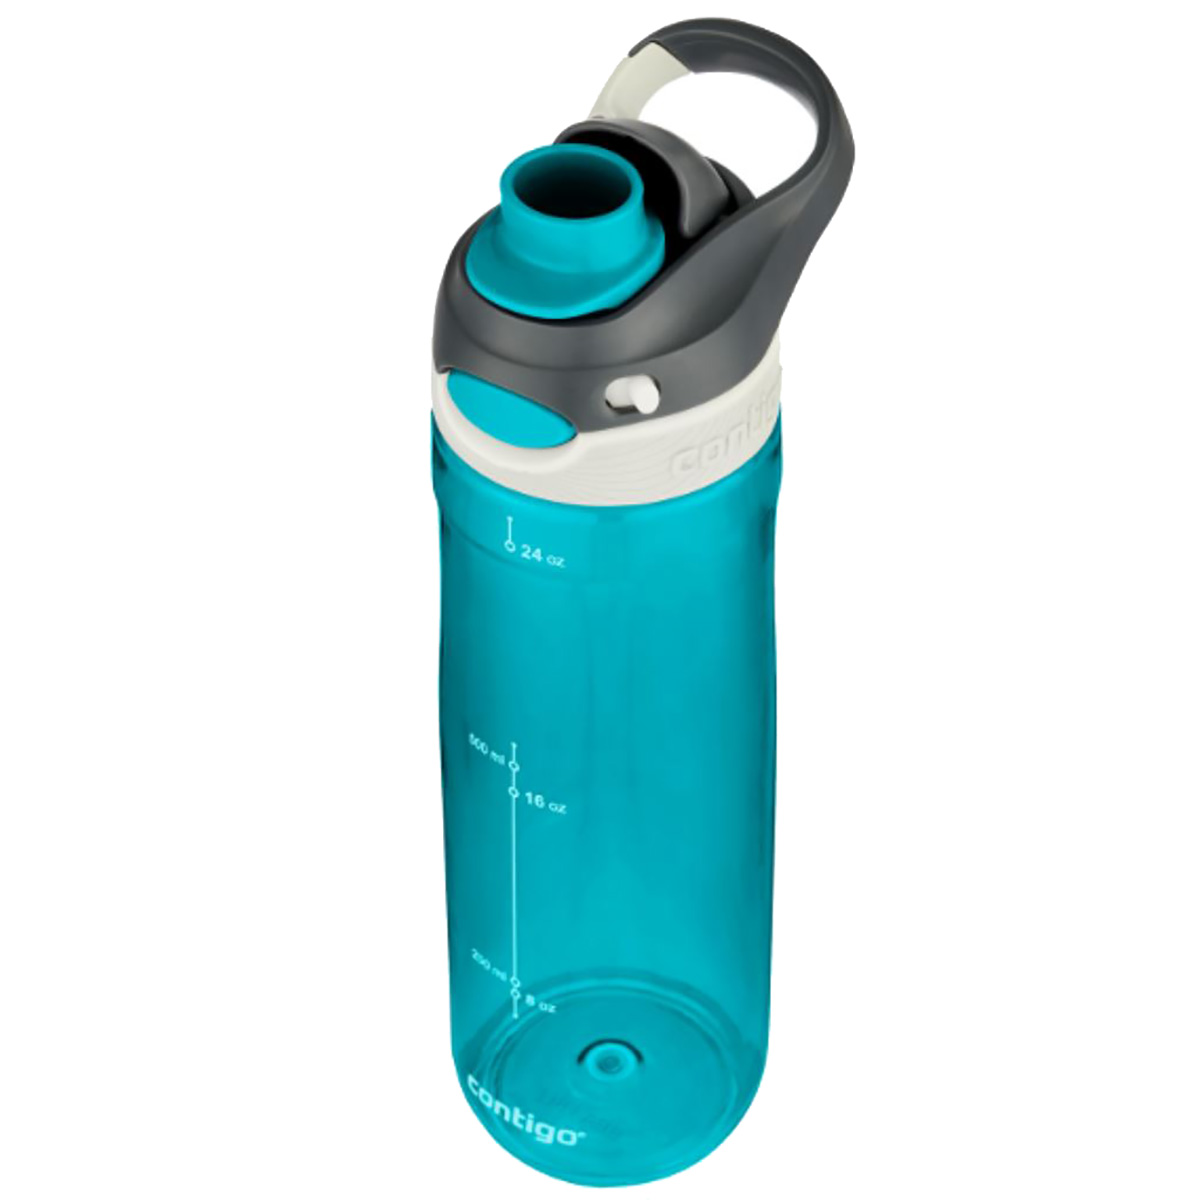 Contigo-24-oz-Chug-Autospout-Leak-Proof-Water-Bottle miniatuur 19